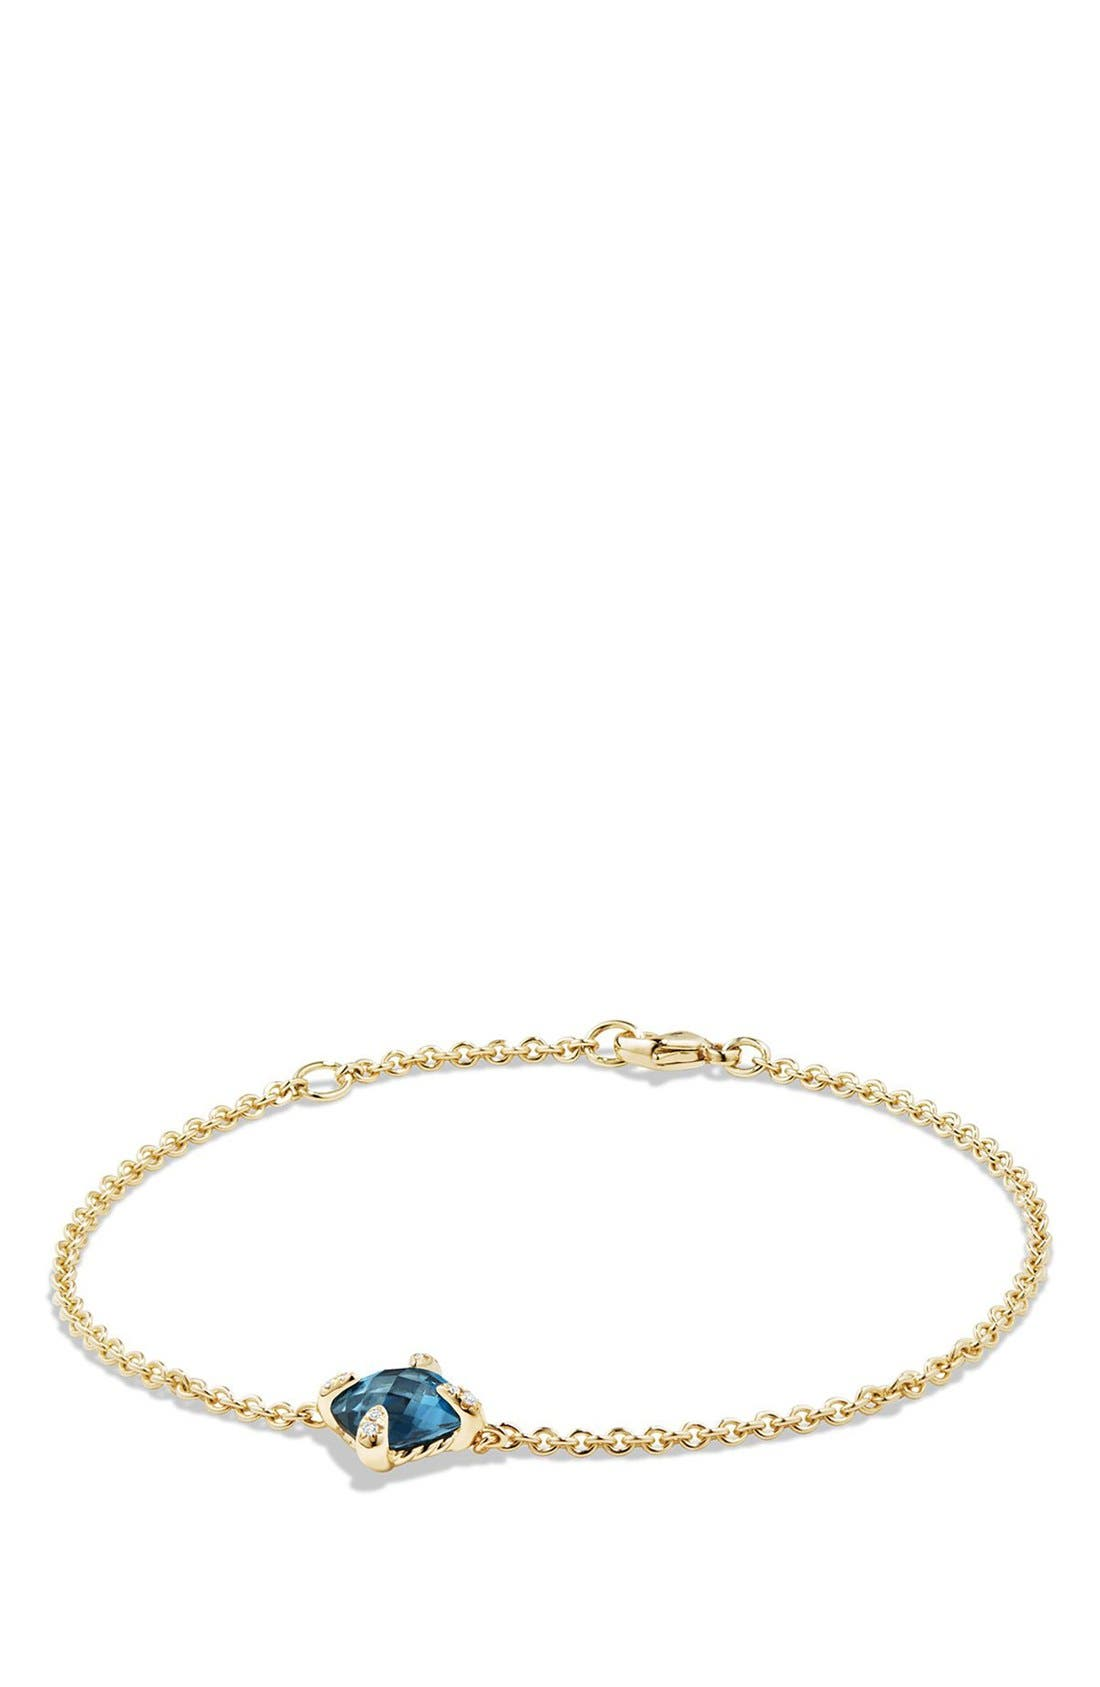 DAVID YURMAN 'Châtelaine' Bracelet with Diamonds in 18K